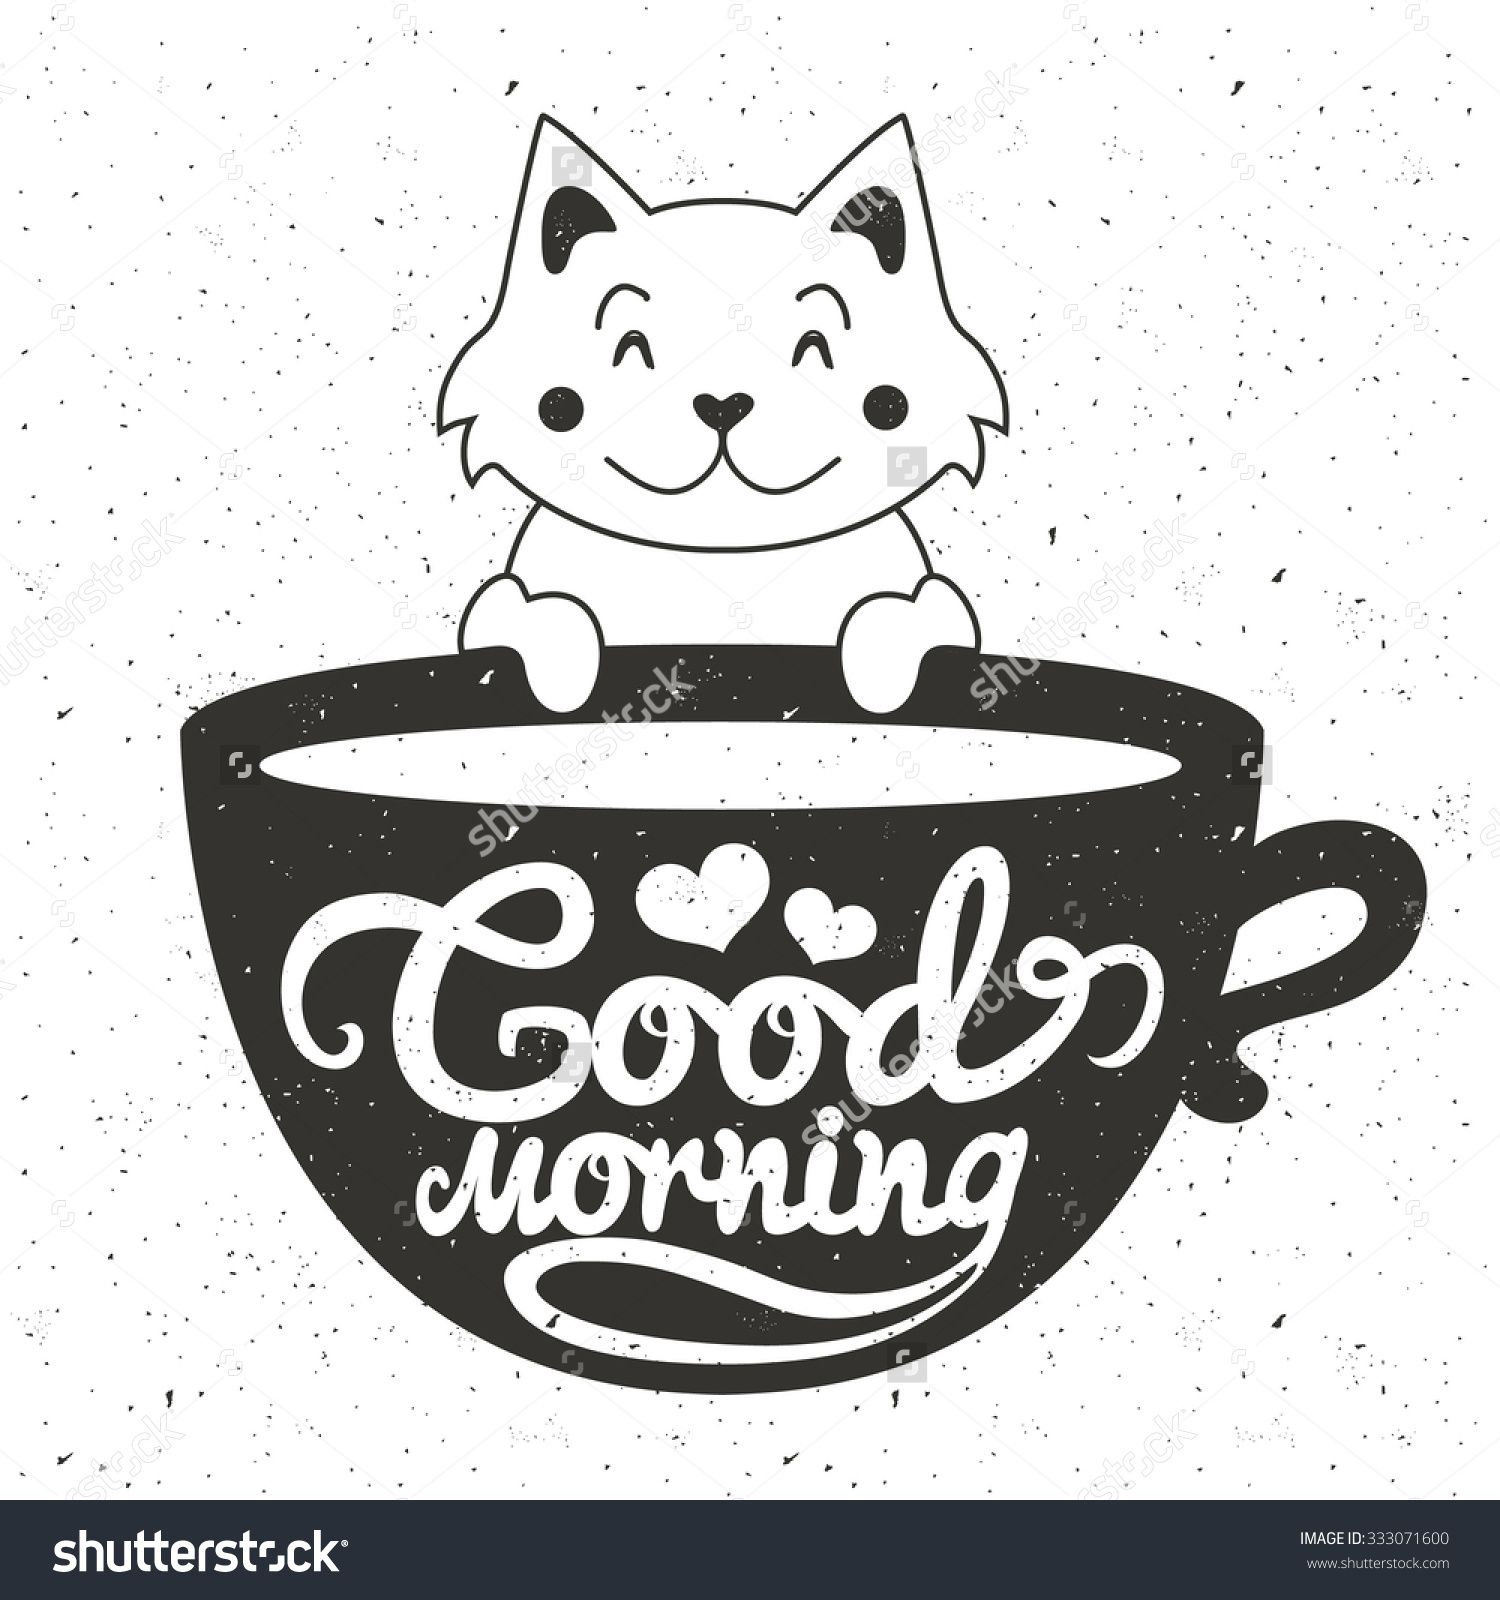 Stock-vector-vector-illustration-of-cute-little-white-cat